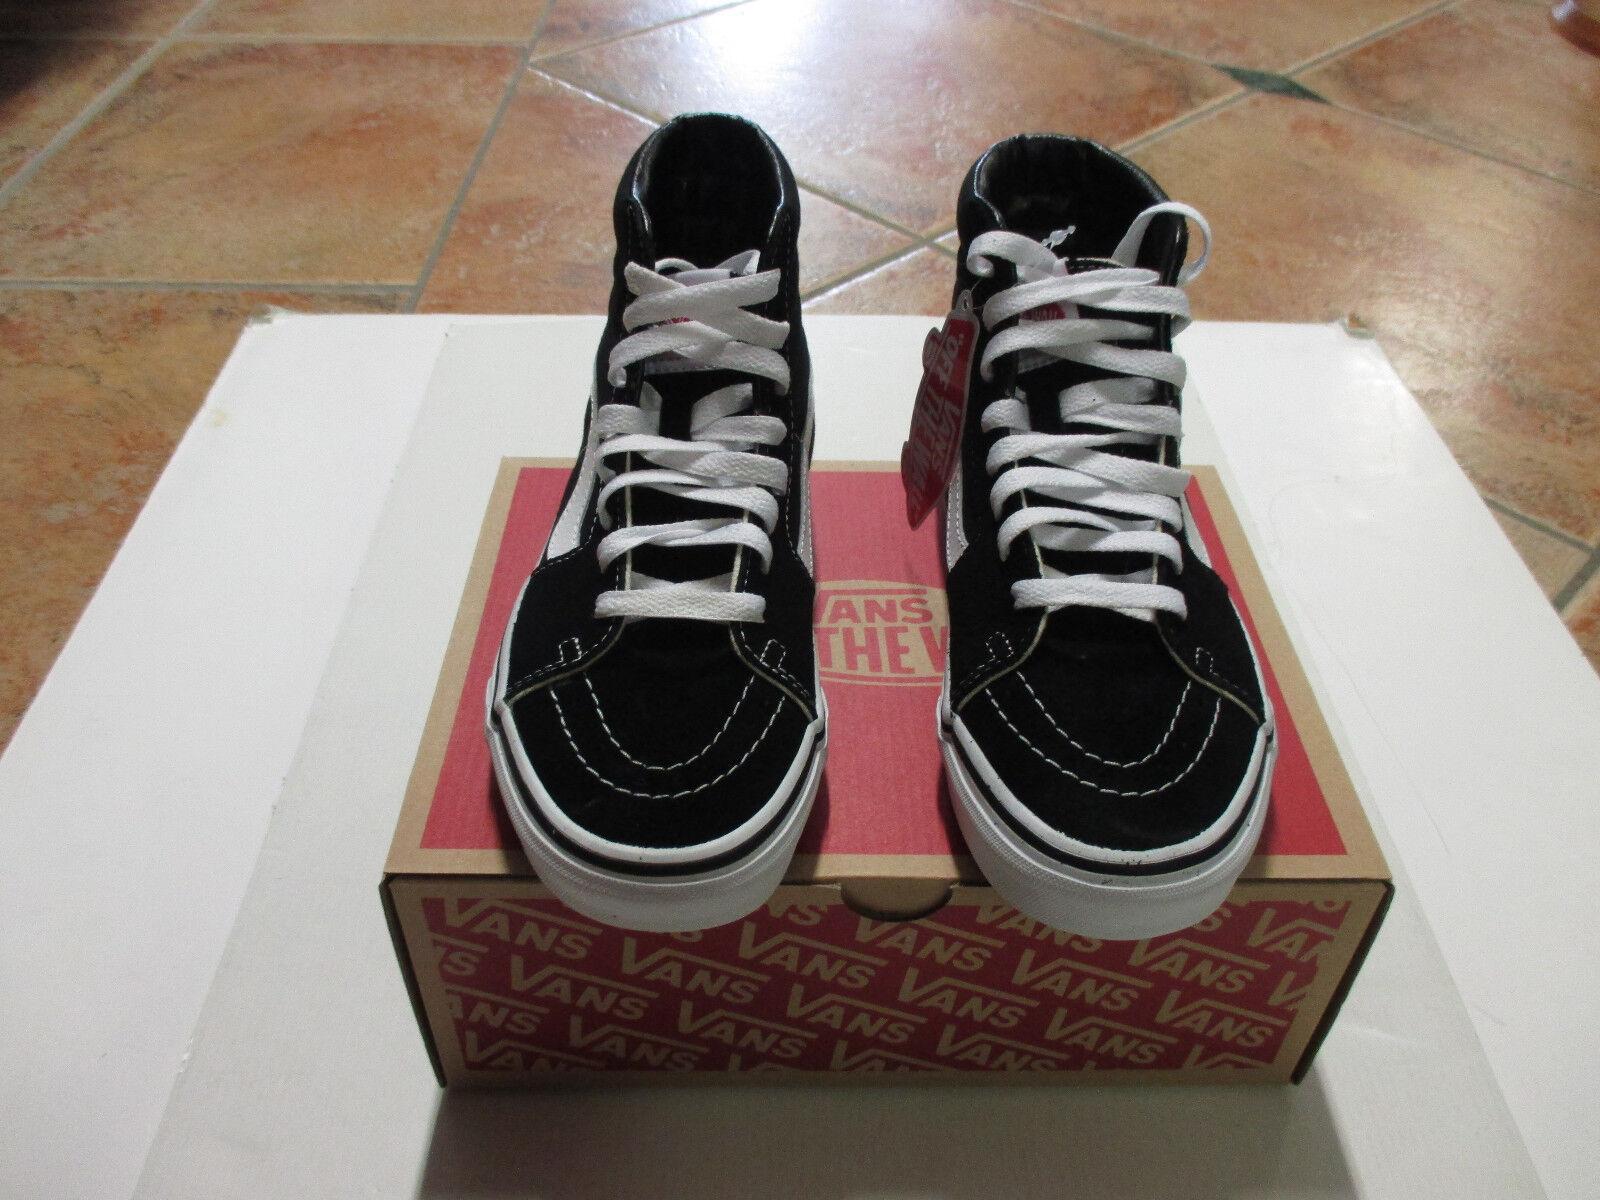 VANS SK8-HI  Farbe:  Black/Black/White  Größe: 40,5  Model: VD5IB8C NEU